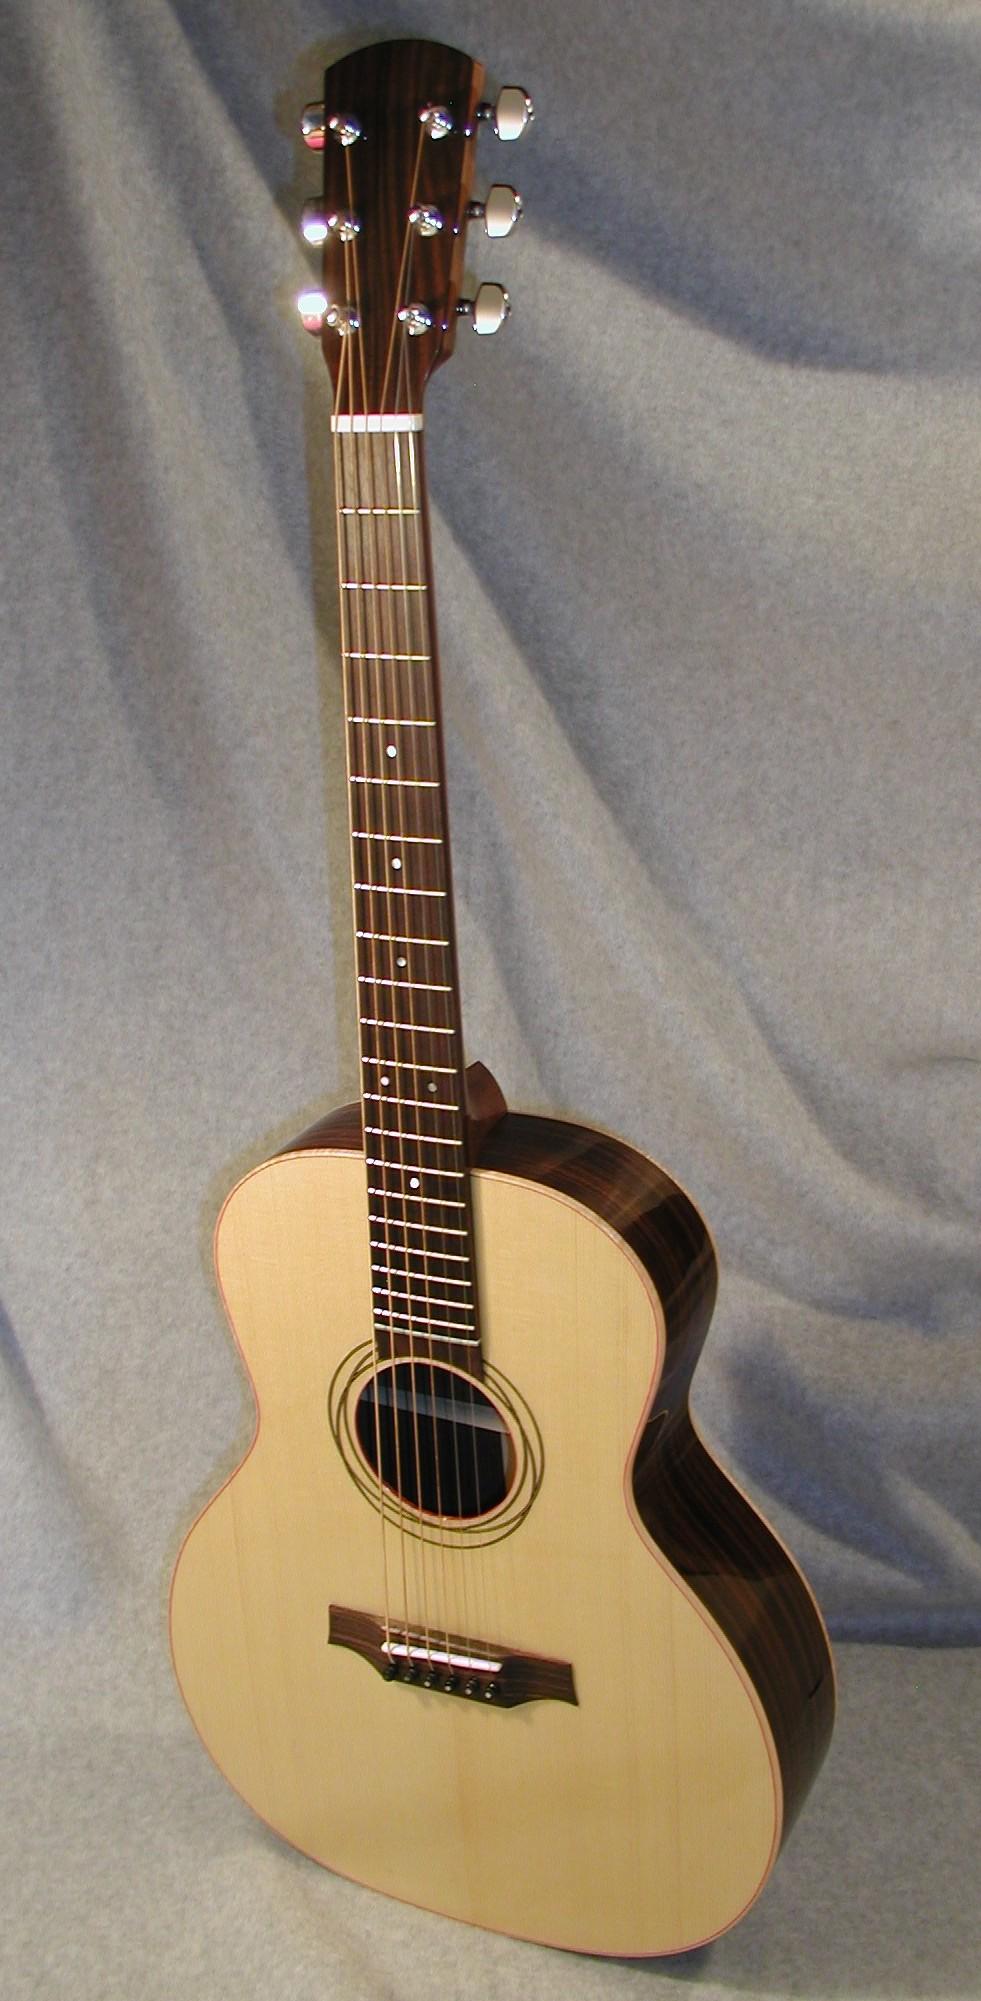 SerenadeF03-Crop-Guitar-Luthier-LuthierDB-Image-2